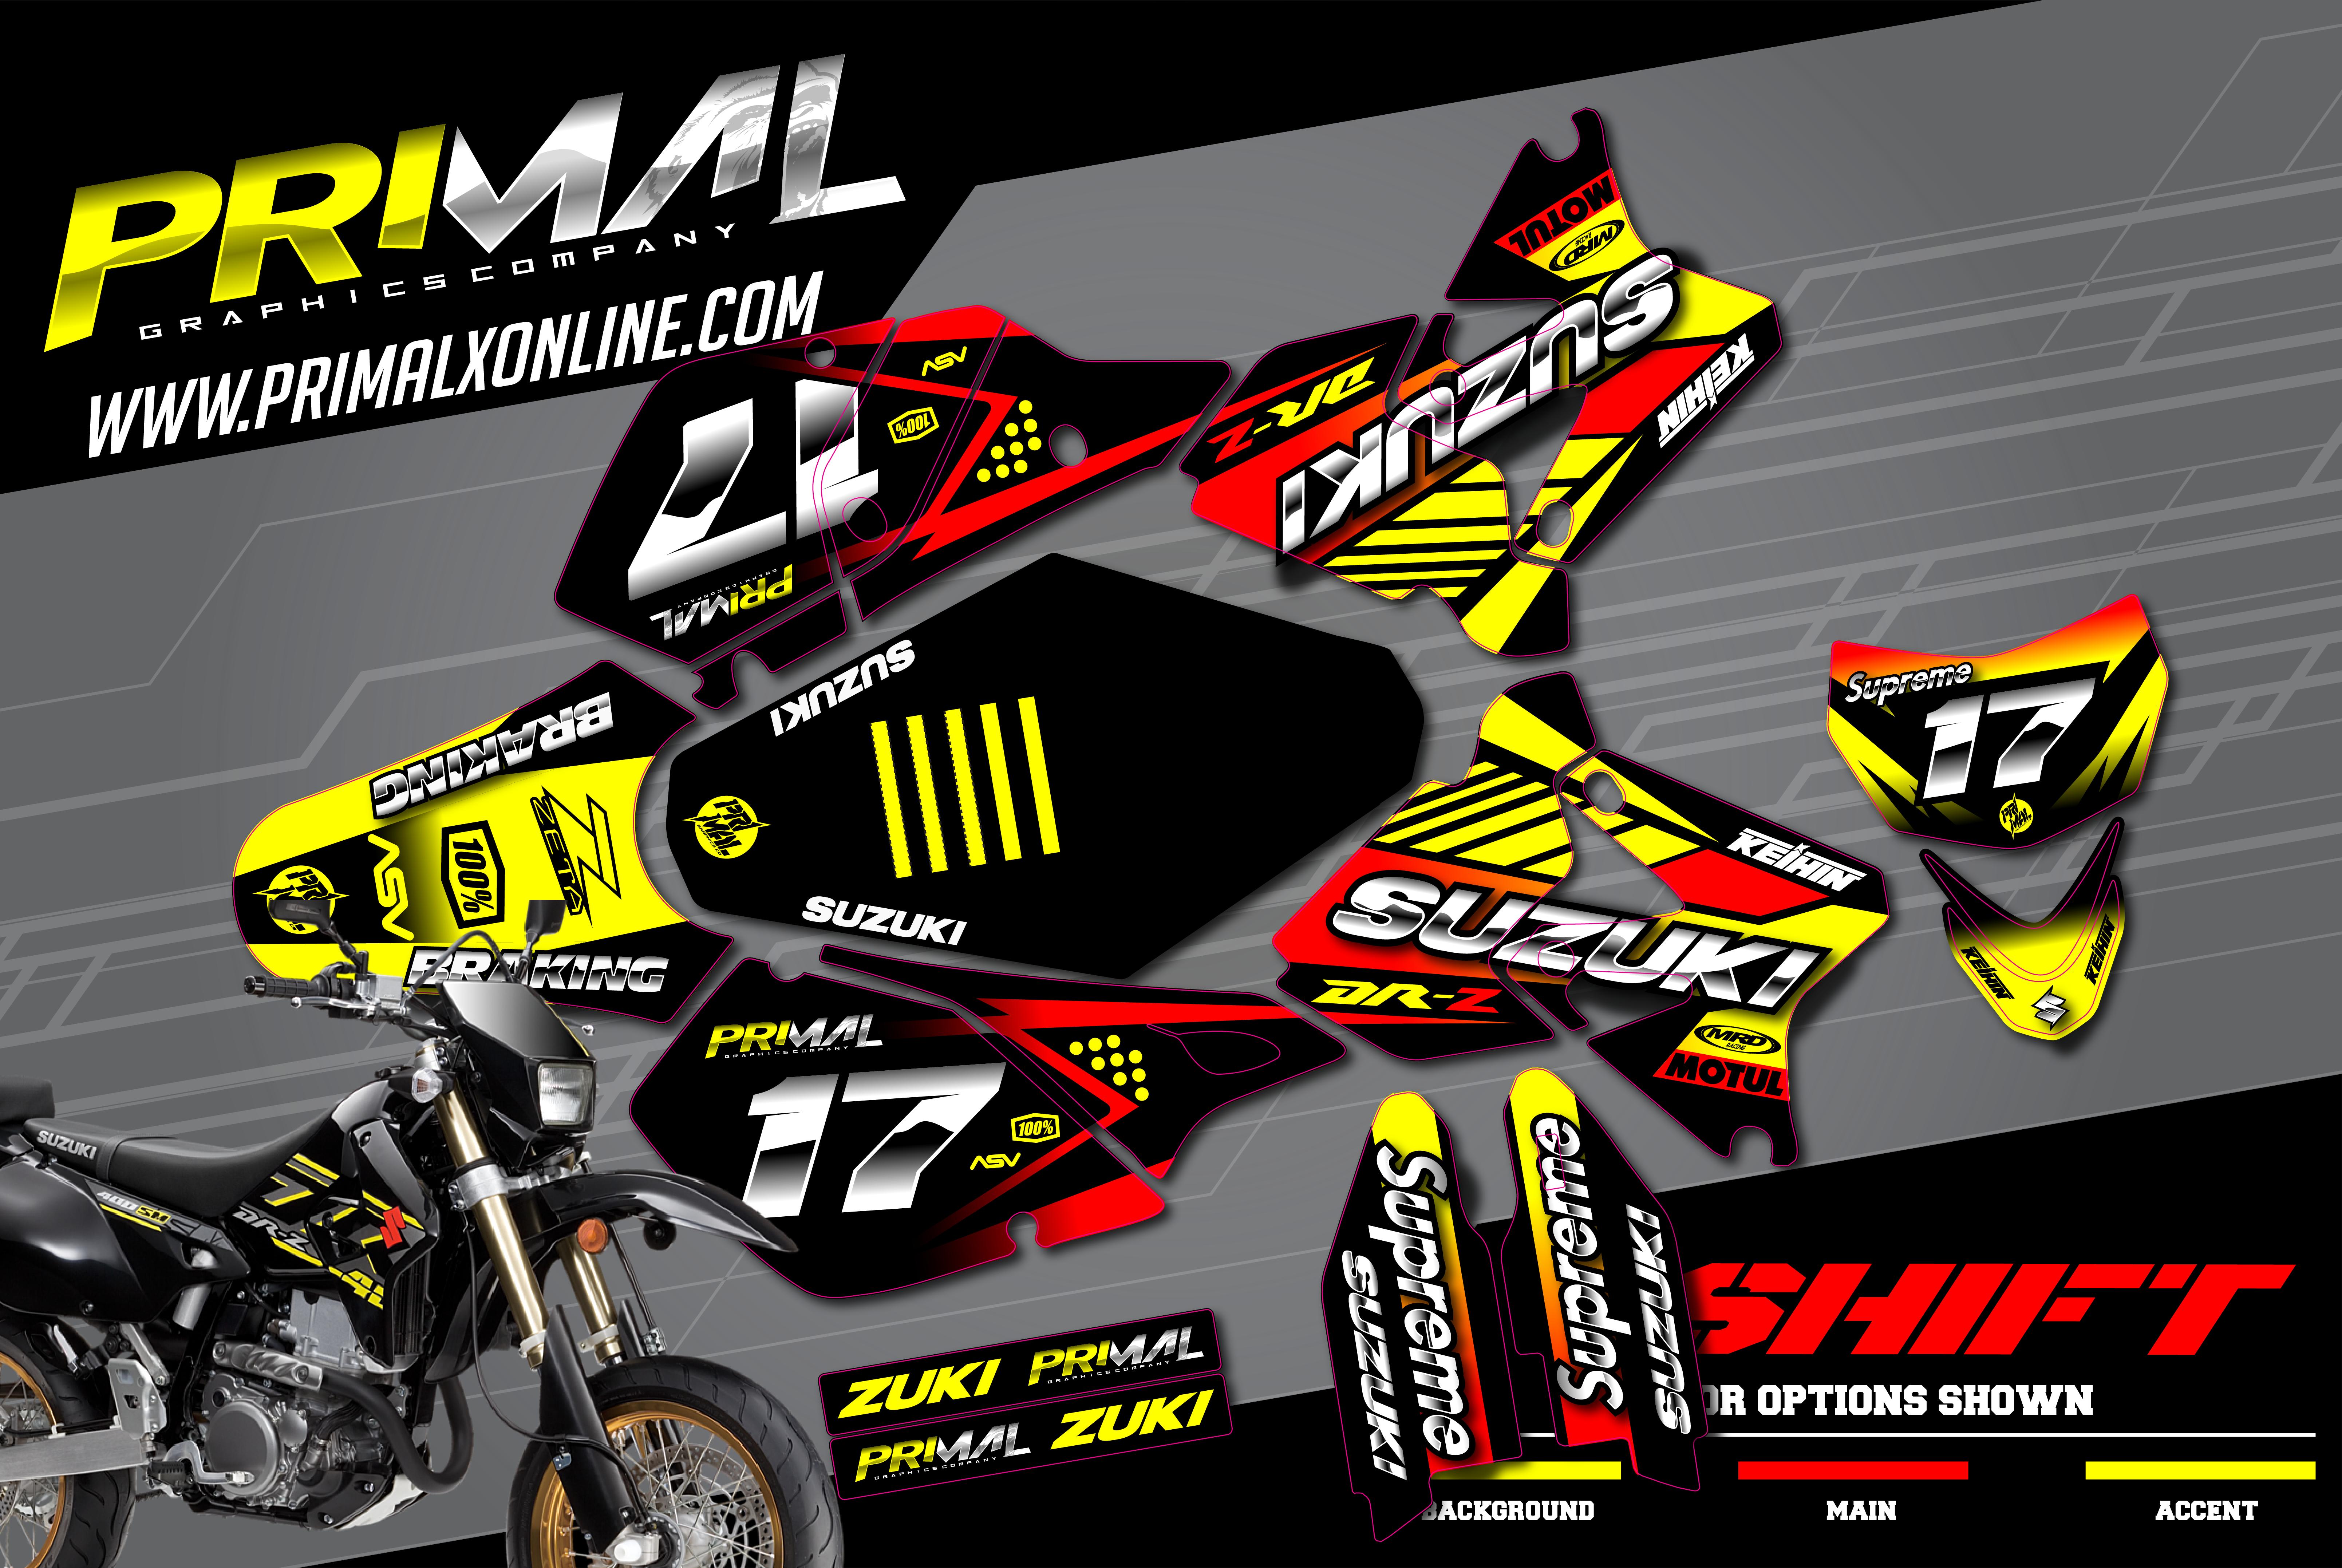 PRIMAL-X-MOTORSPORTS-PRIMAL-GRAPHICS-CO-2021-SUZUKI-DRZ400SM-MOTOCROSS-GRAPHICS-SHIFT-SERIES-01